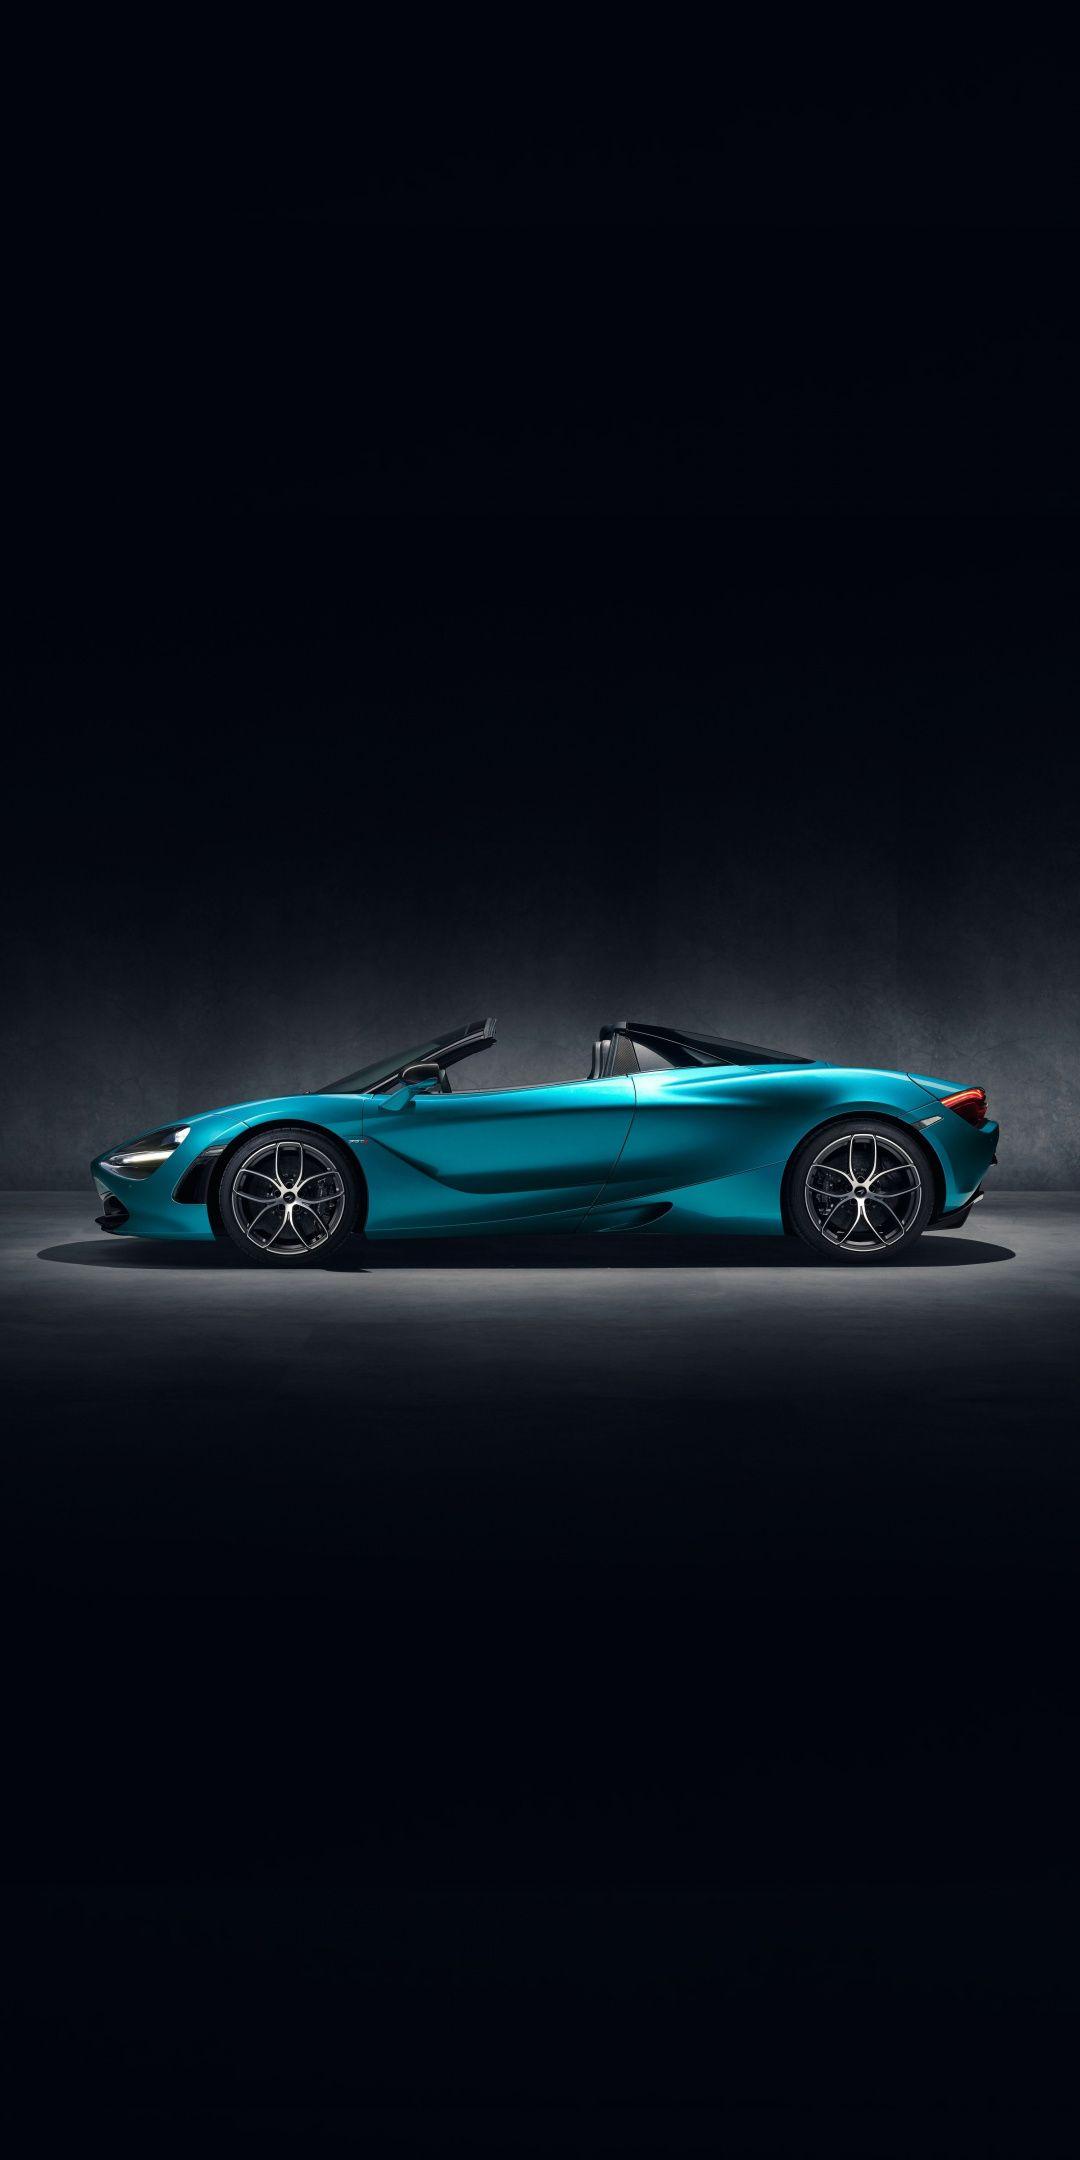 Sports Car Mclaren 720s Sky Blue Side View 1080x2160 Wallpaper